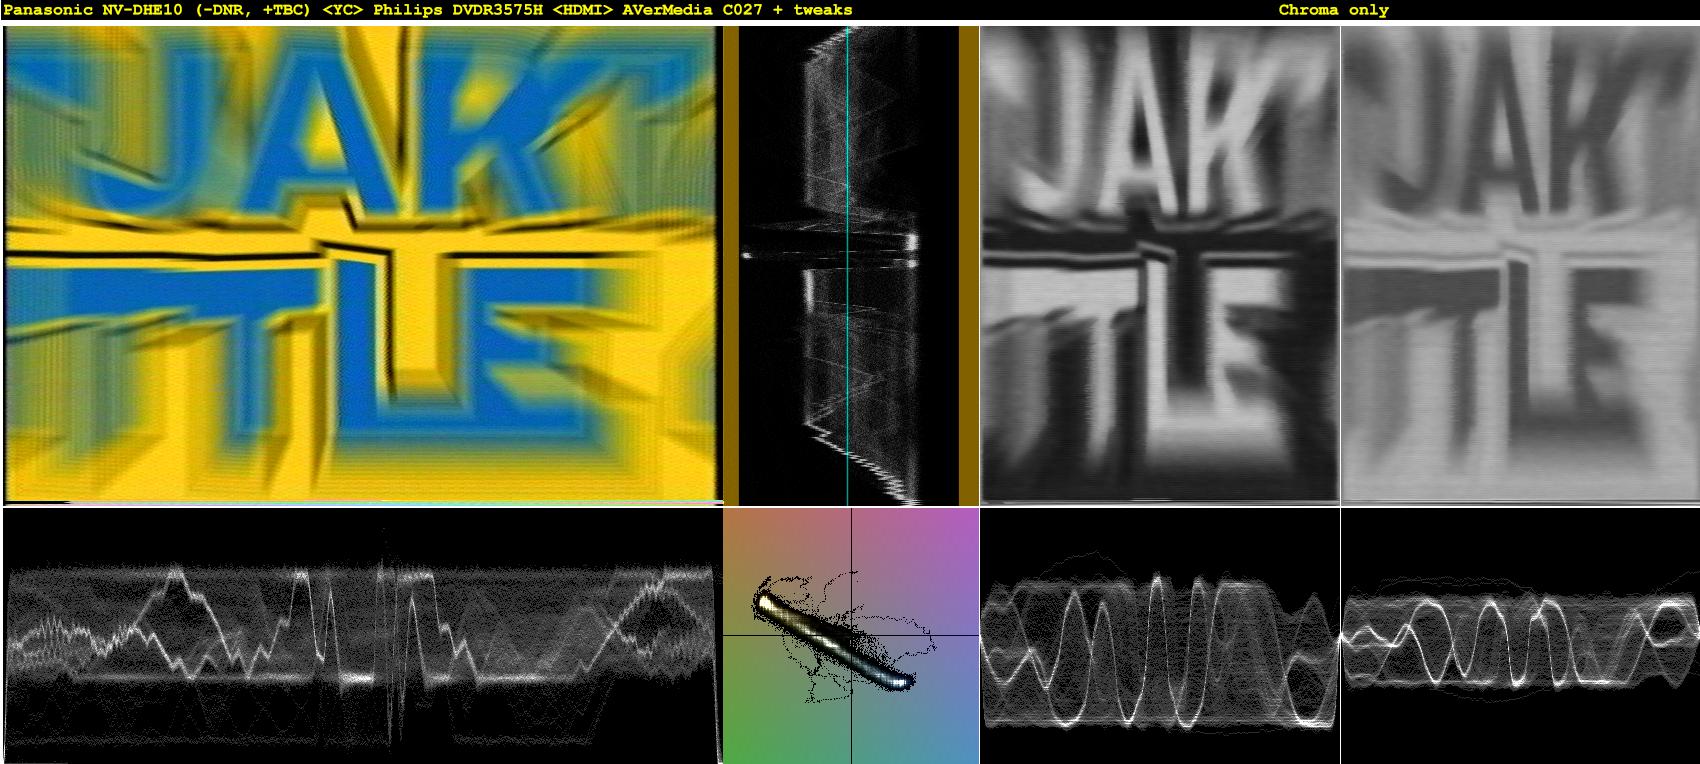 Click image for larger version  Name:0-05-05 - Panasonic NV-DHE10 (-DNR, +TBC).png Views:746 Size:1.15 MB ID:38007